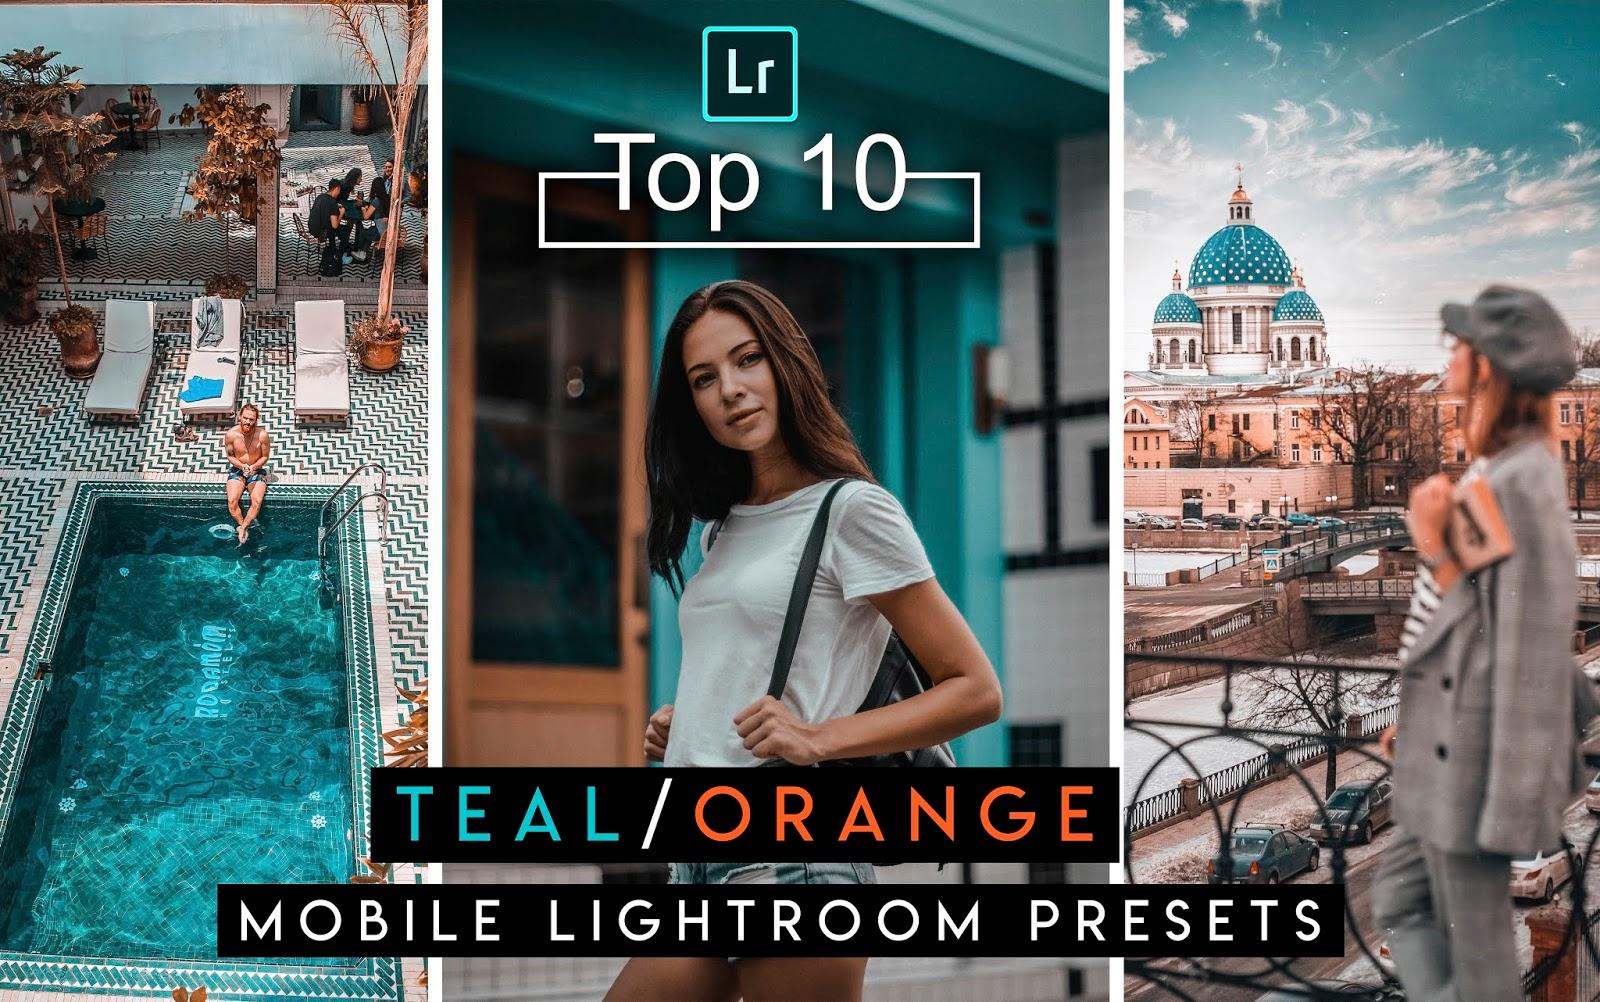 Download Top 10 Teal & Orange Mobile Lightroom Presets for Free | How to Download Aqua & Brown Mobile Lightroom Presets for Free